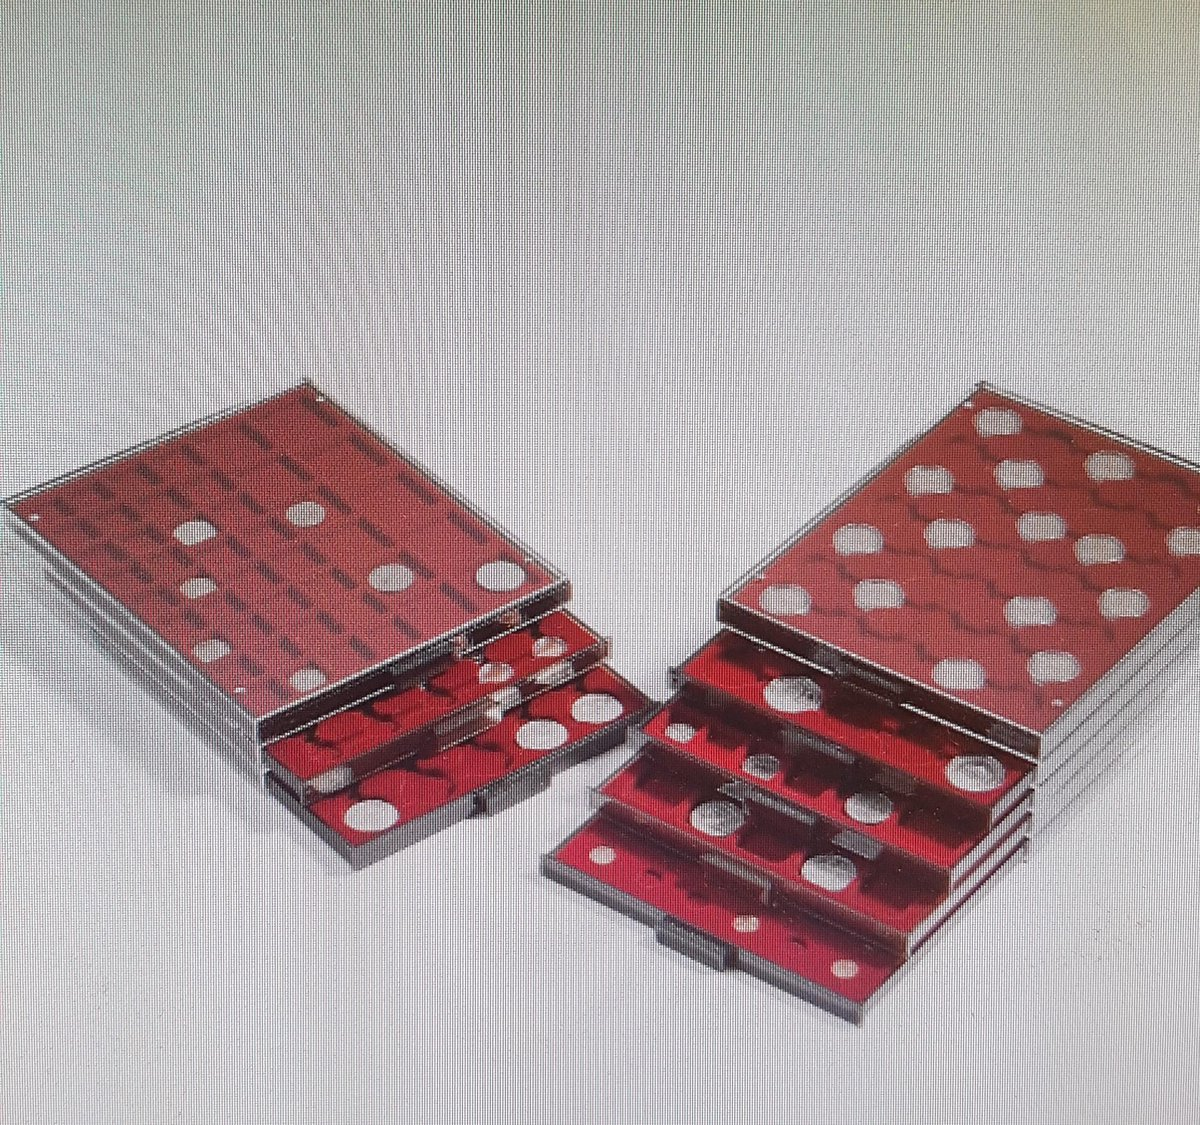 Leuchtturm muntcassette 42 vaks voor 5 euro munten